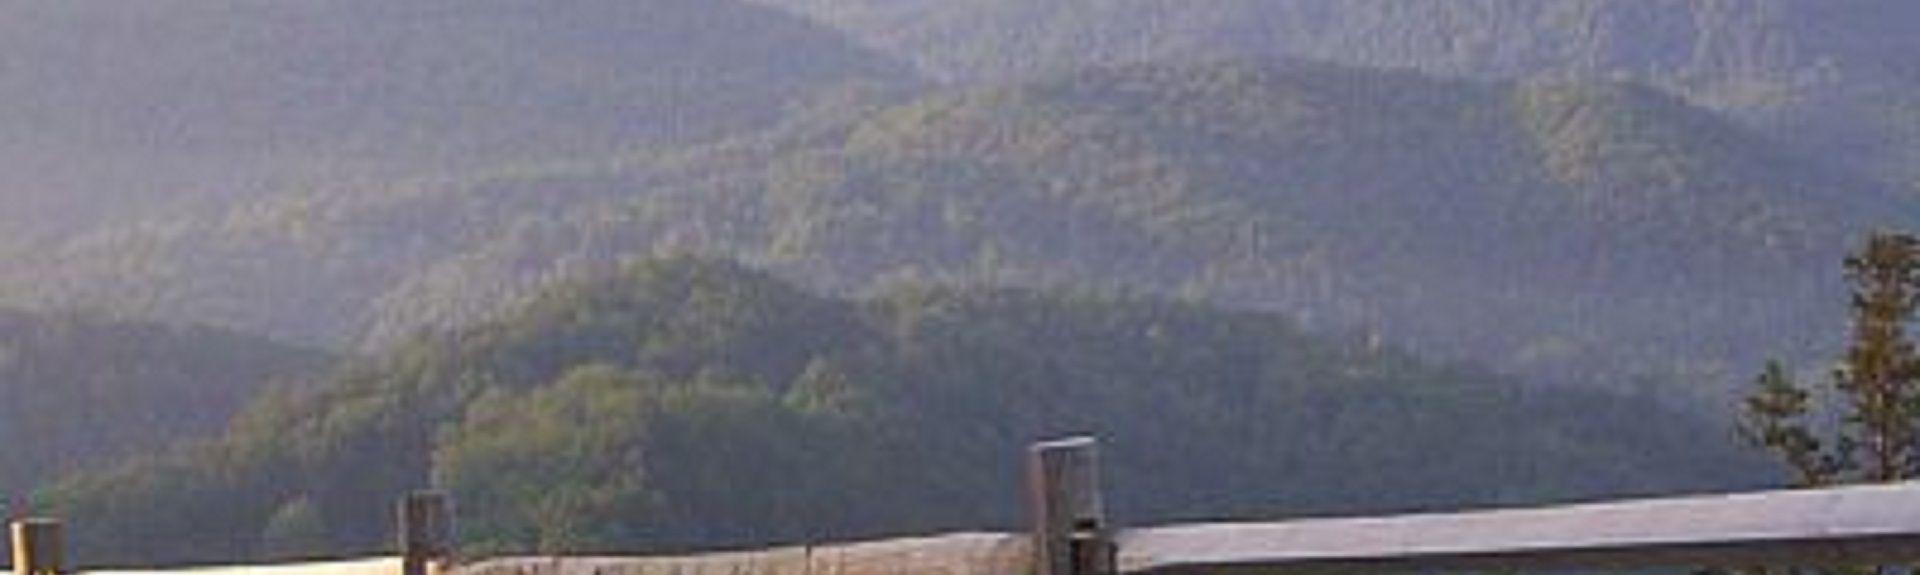 Cascate Tom Branch Falls, Cherokee, North Carolina, Stati Uniti d'America